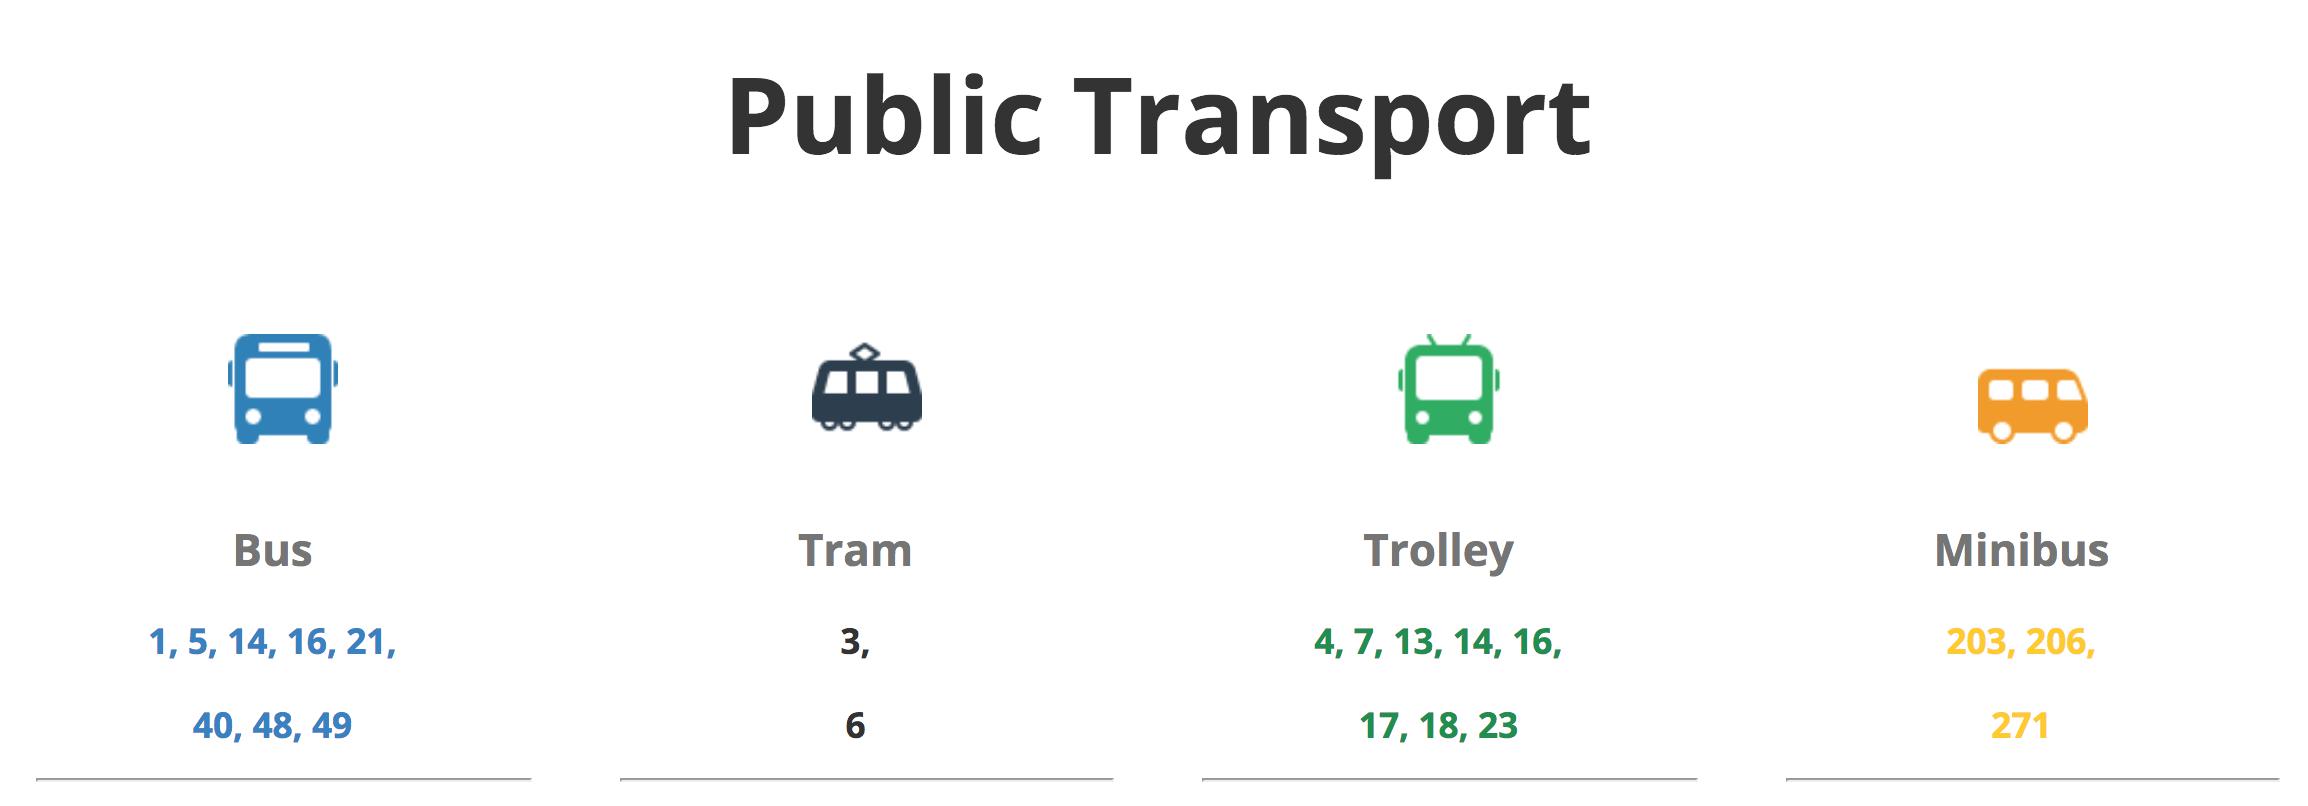 Public transport in Teika neighborhood, Riga.